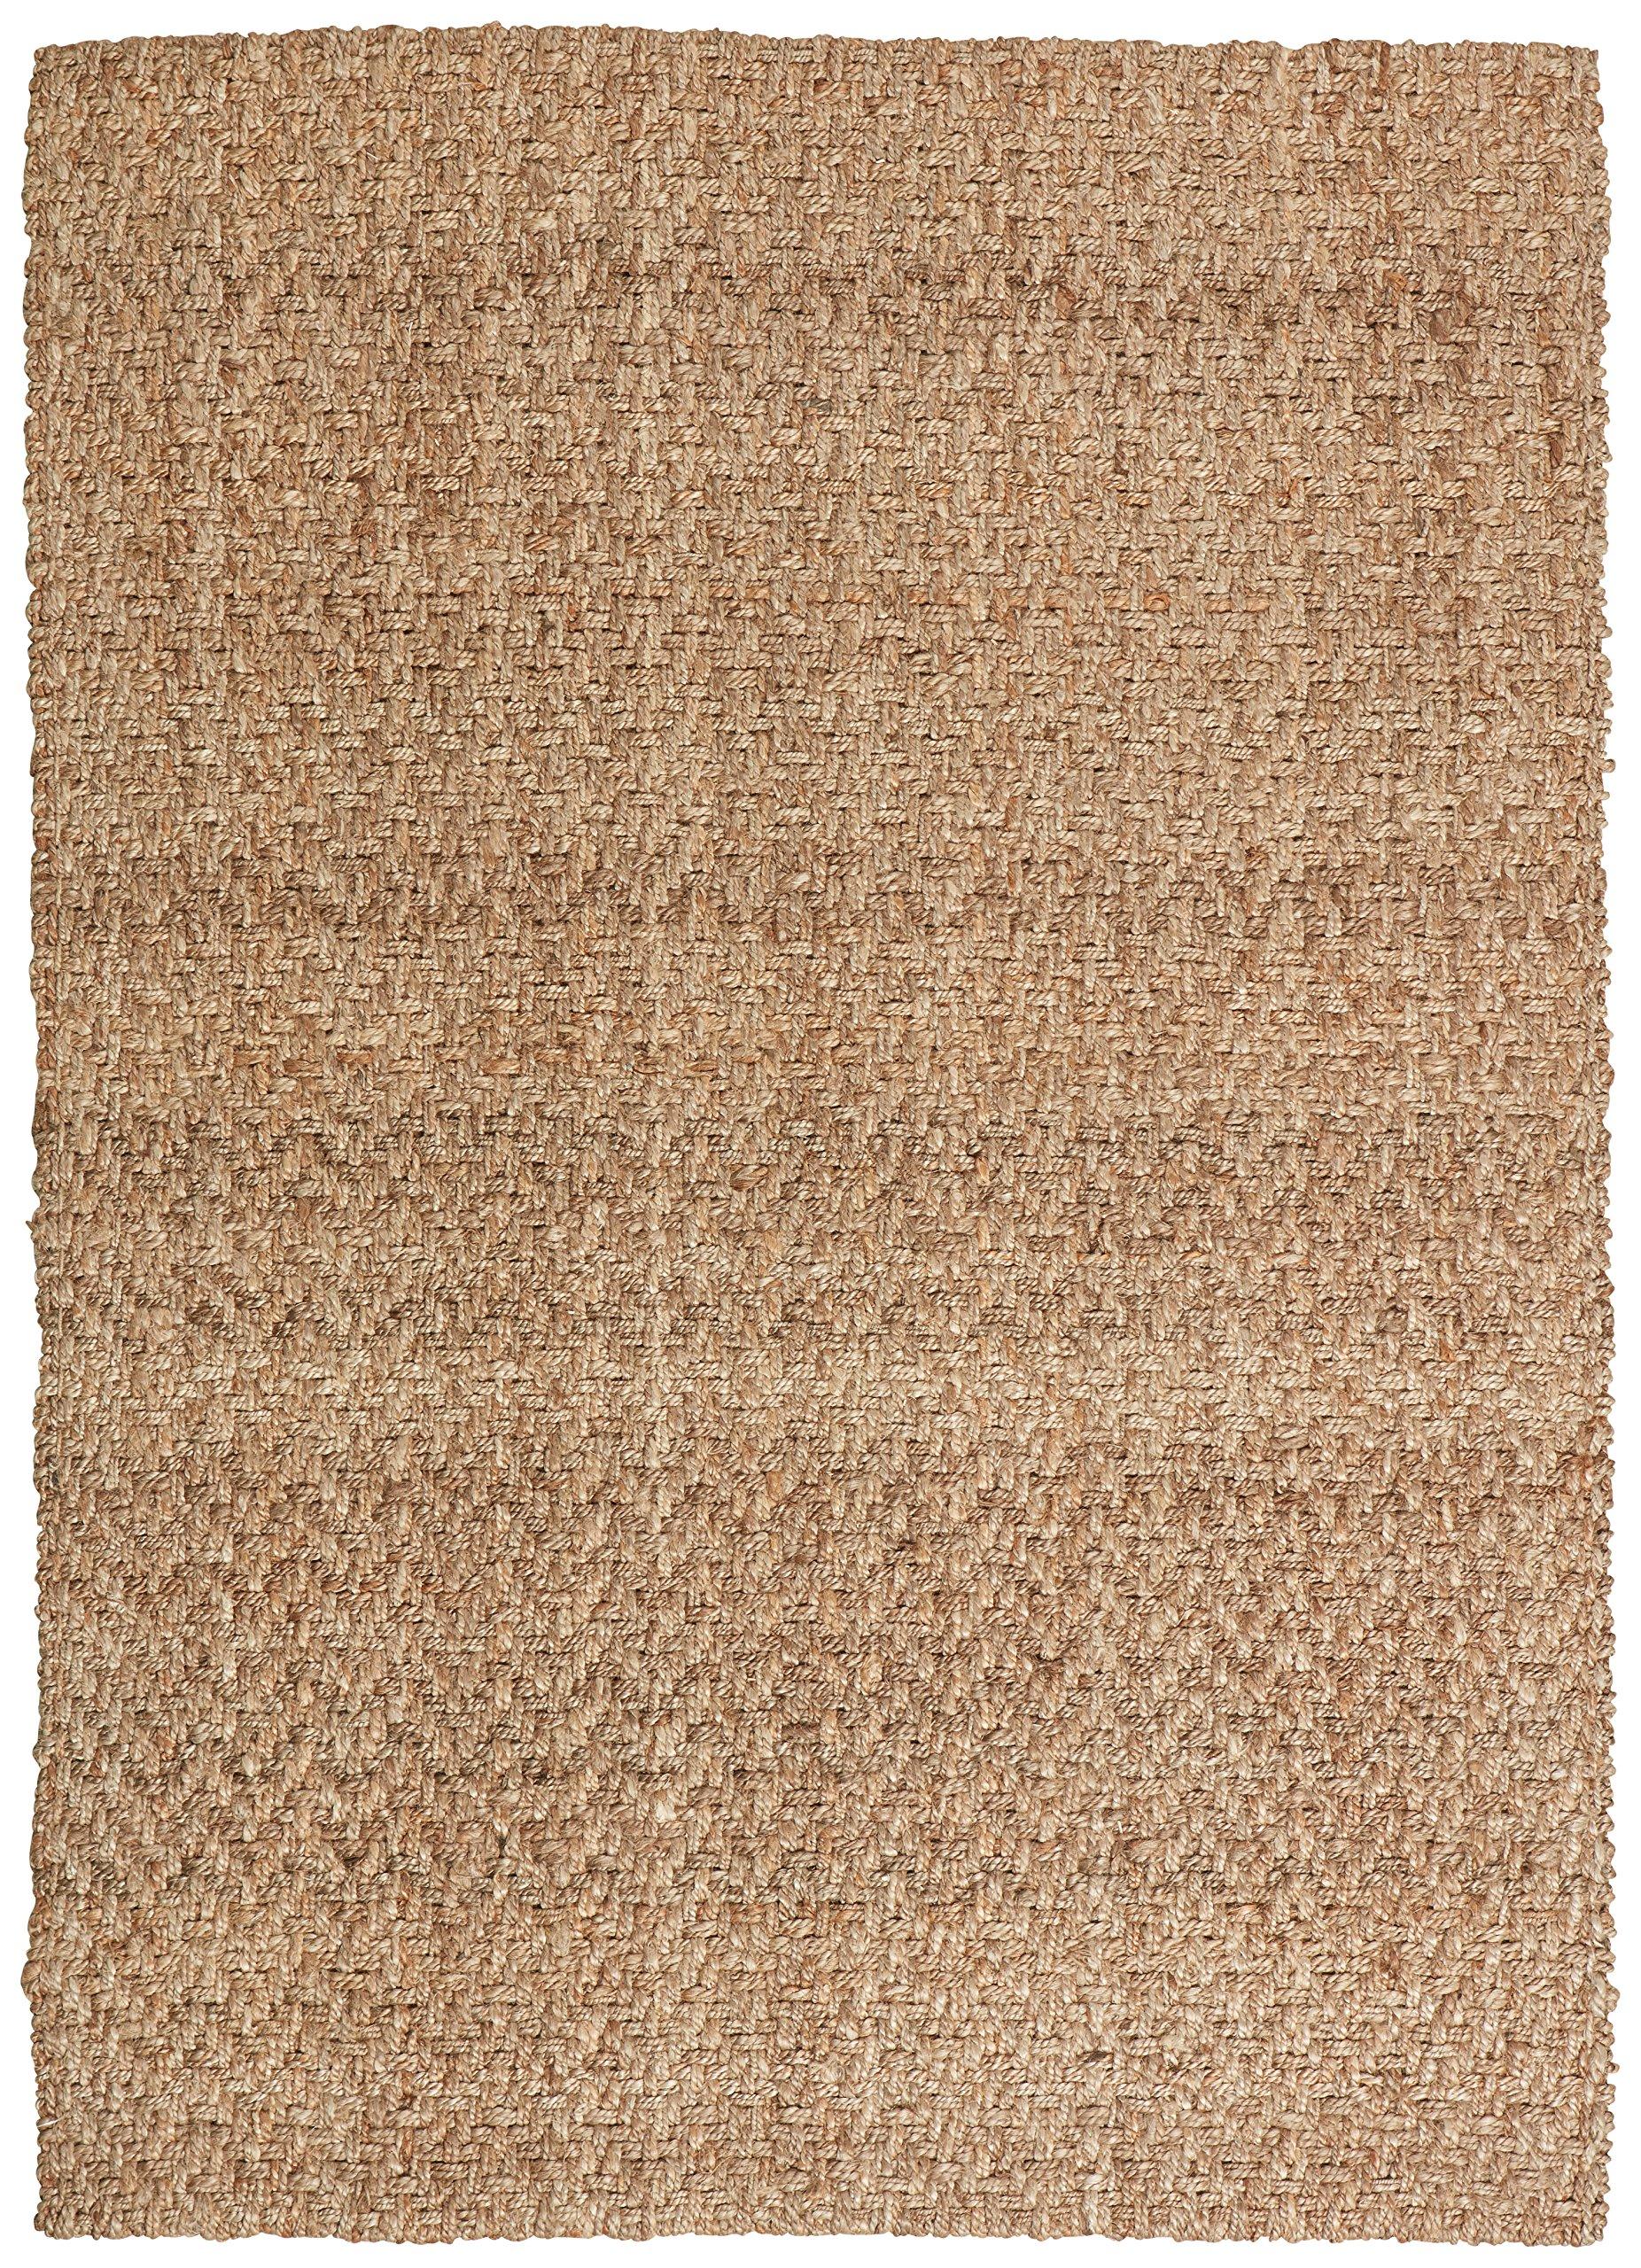 Stone & Beam Contemporary Textured Jute Rug, 5' x 7', Tan